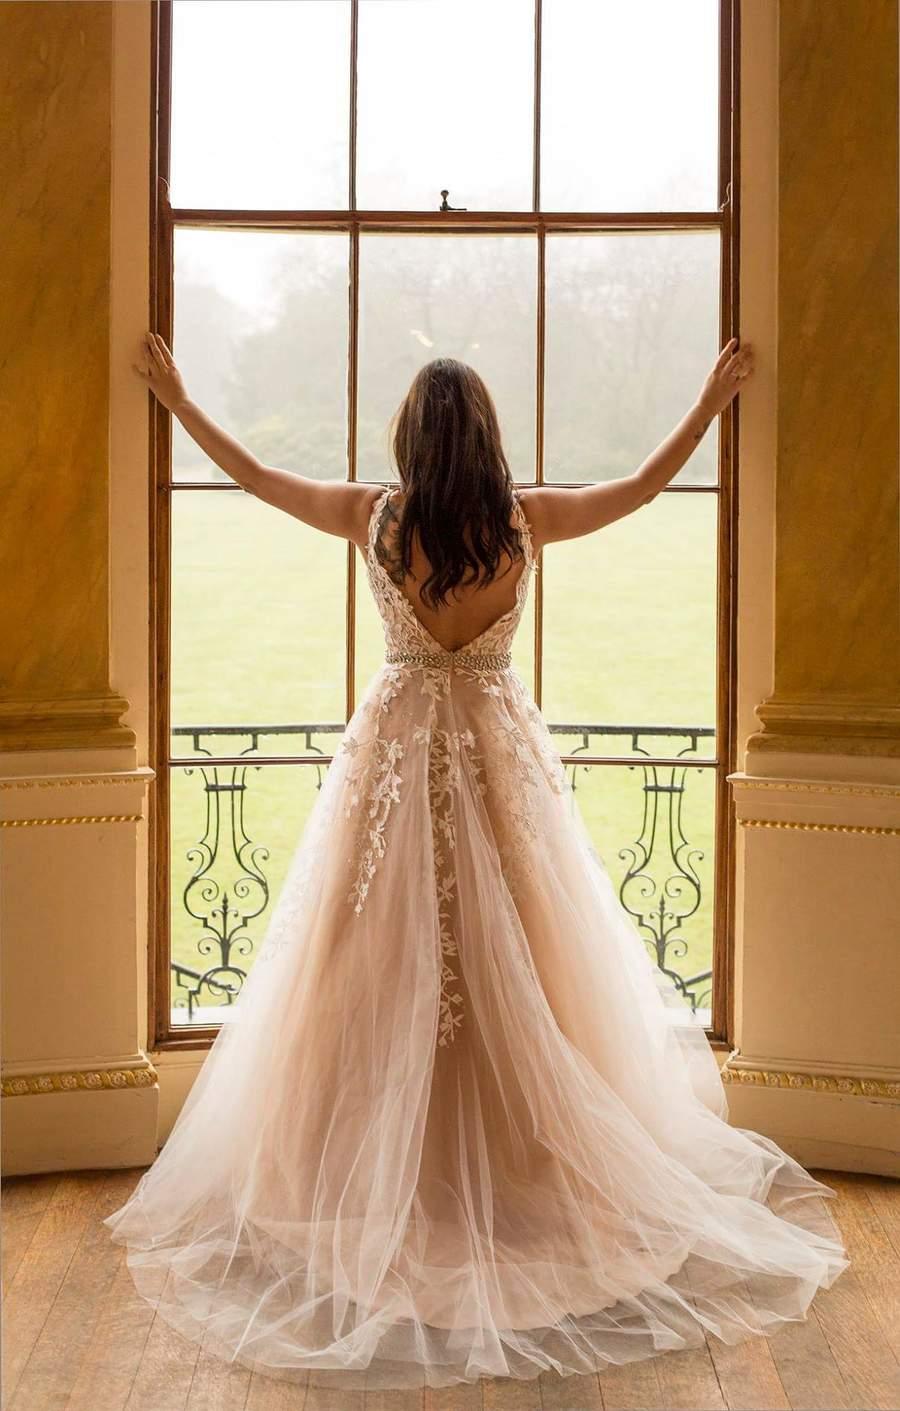 Model Daniella Marie / Uploaded 21st March 2018 @ 09:10 PM